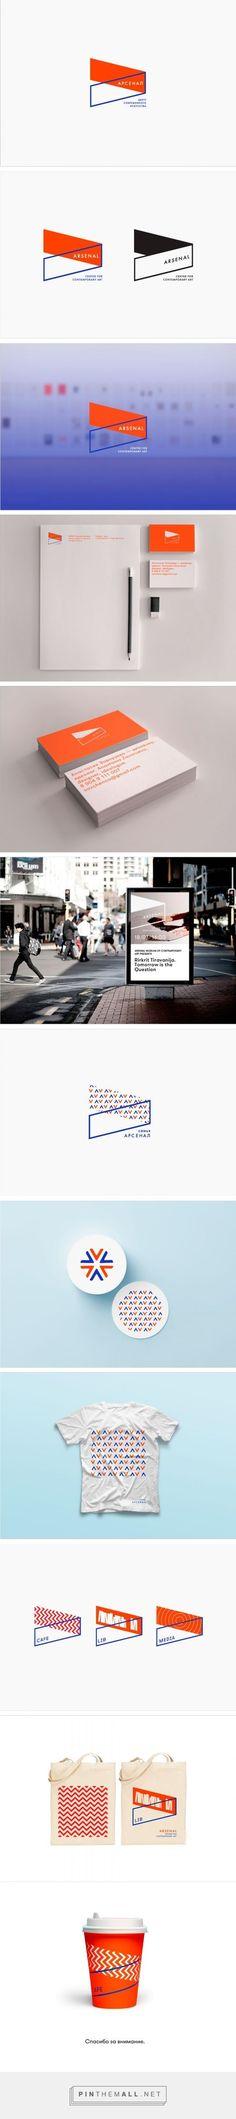 Identity © Sergey Kruglov - created on Design Logo, Design Poster, Brand Identity Design, Graphic Design Branding, Corporate Design, Corporate Identity, Visual Identity, City Branding, Logo Branding